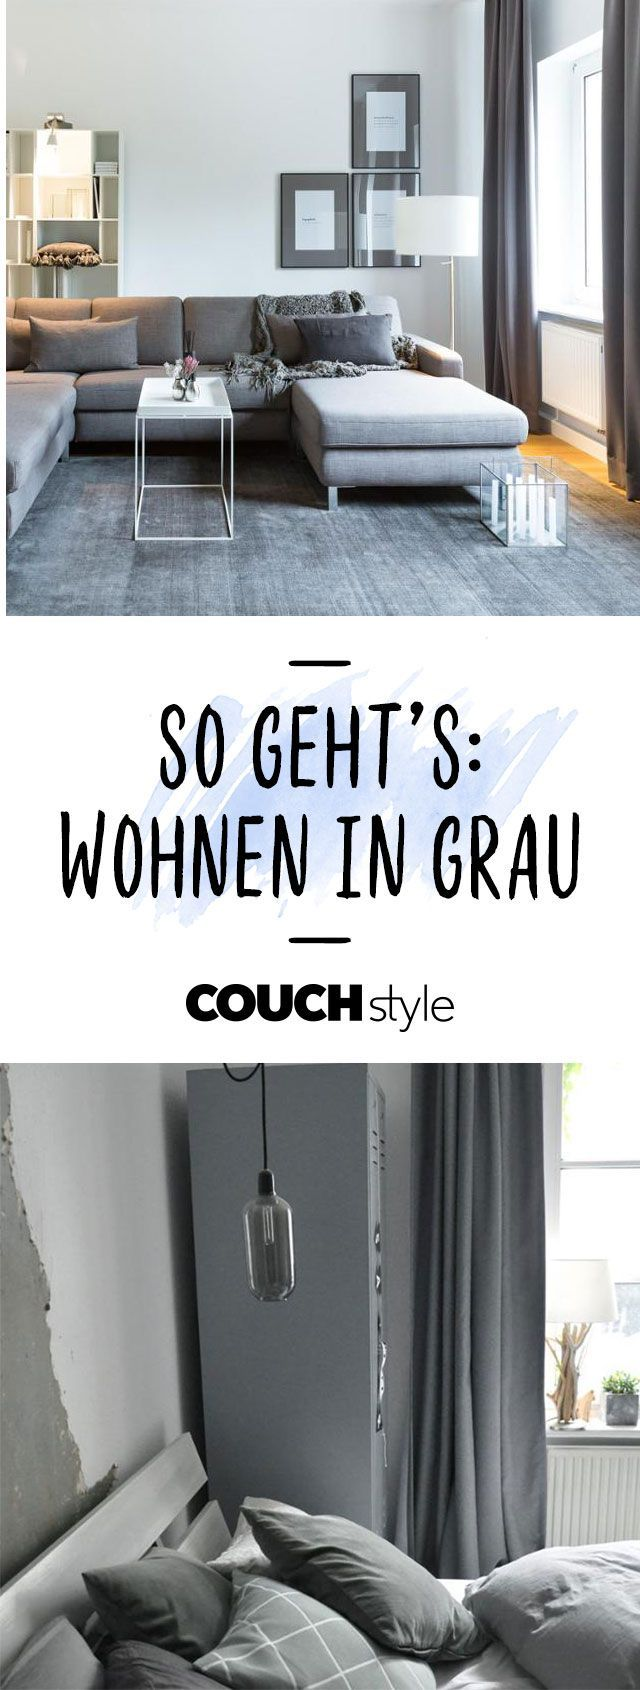 Grau Bilder Ideen In 2019 Farbgestaltung Couch Grau Teppich